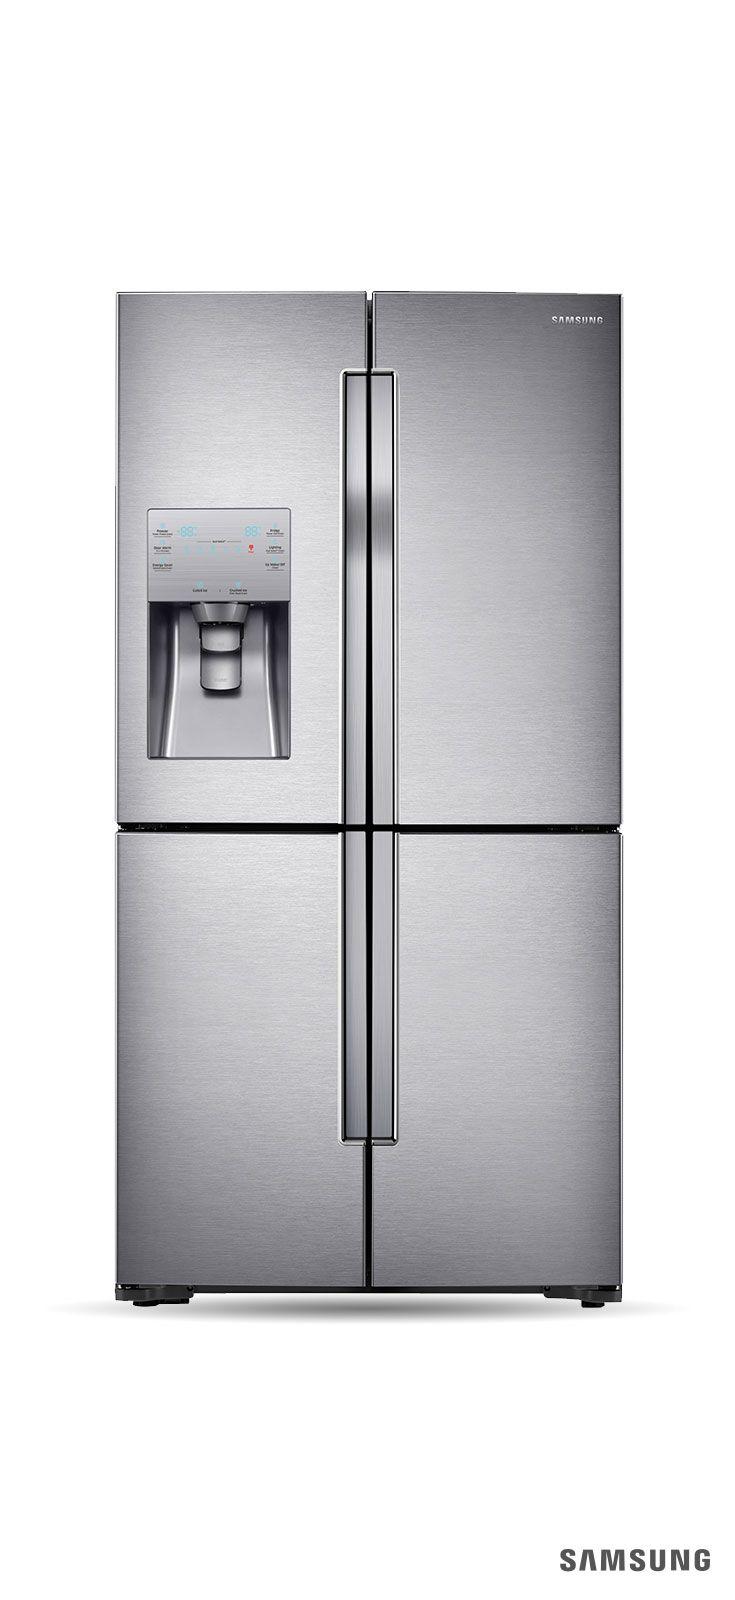 Energy Efficient Kitchen Appliances 17 Best Images About Samsung Kitchen Collection On Pinterest